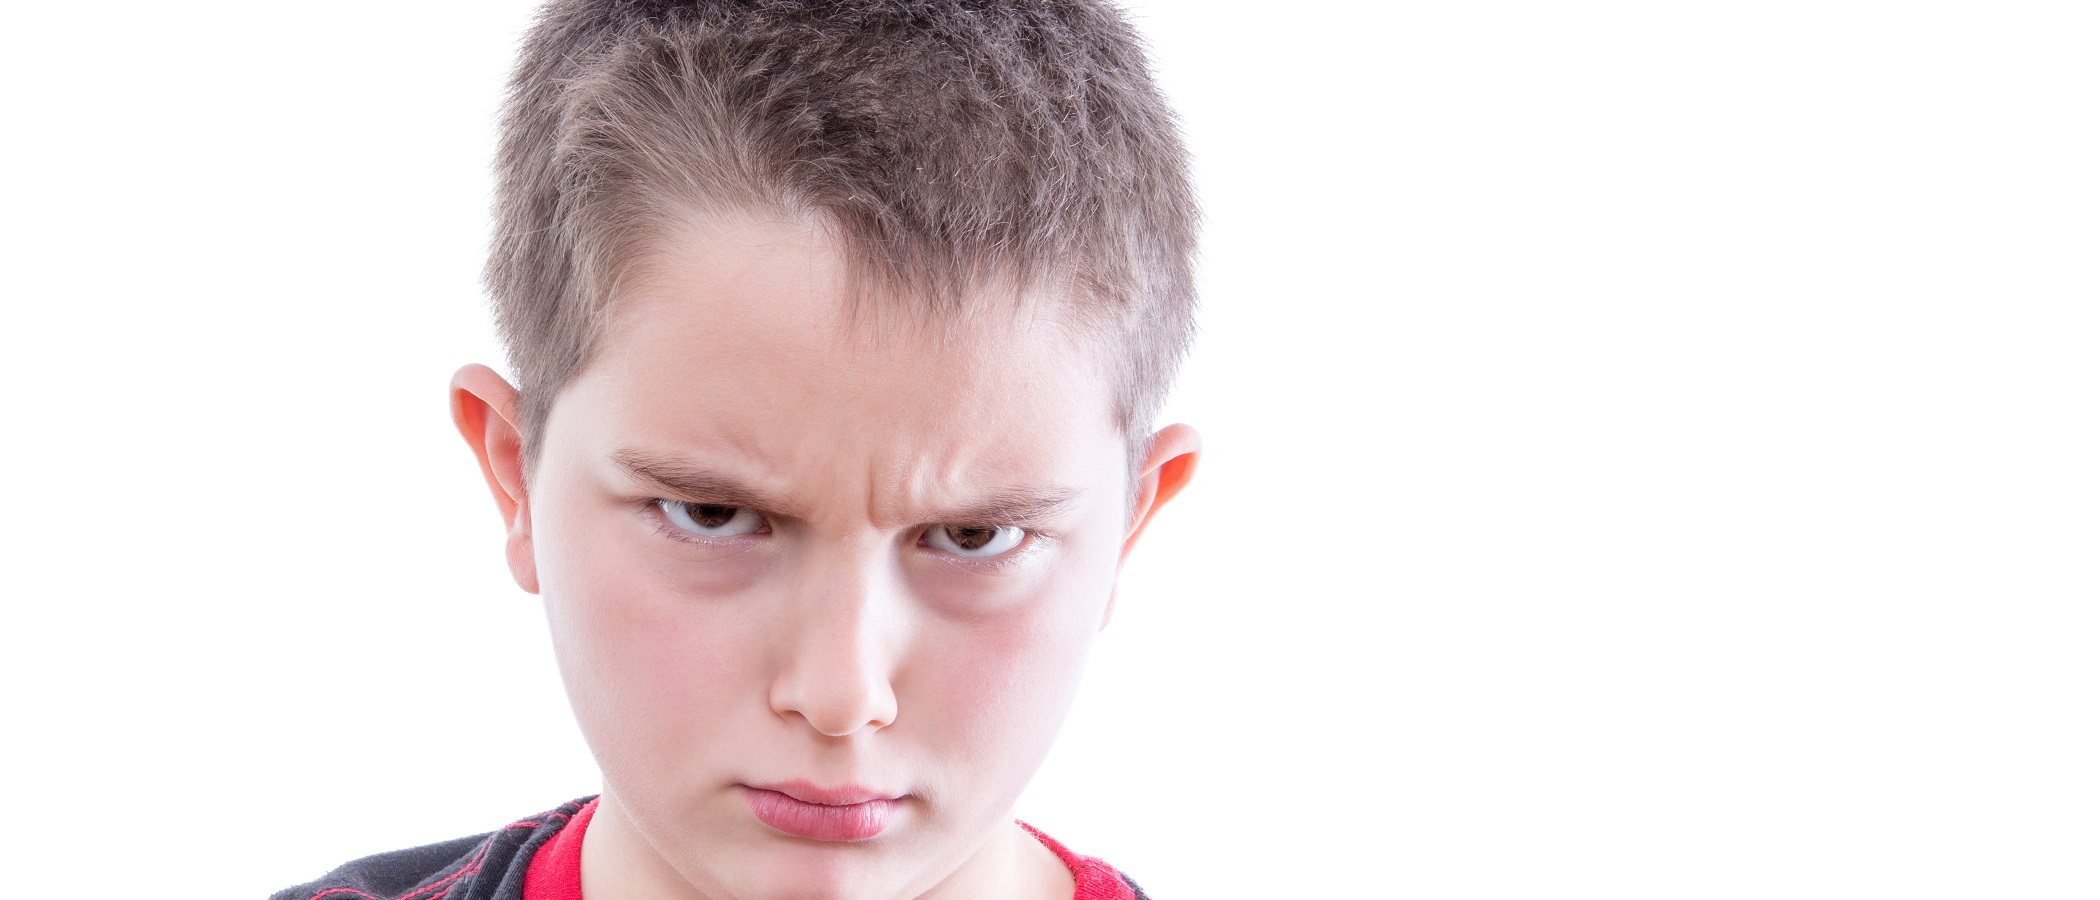 Señales de que estás criando a un niño hostil